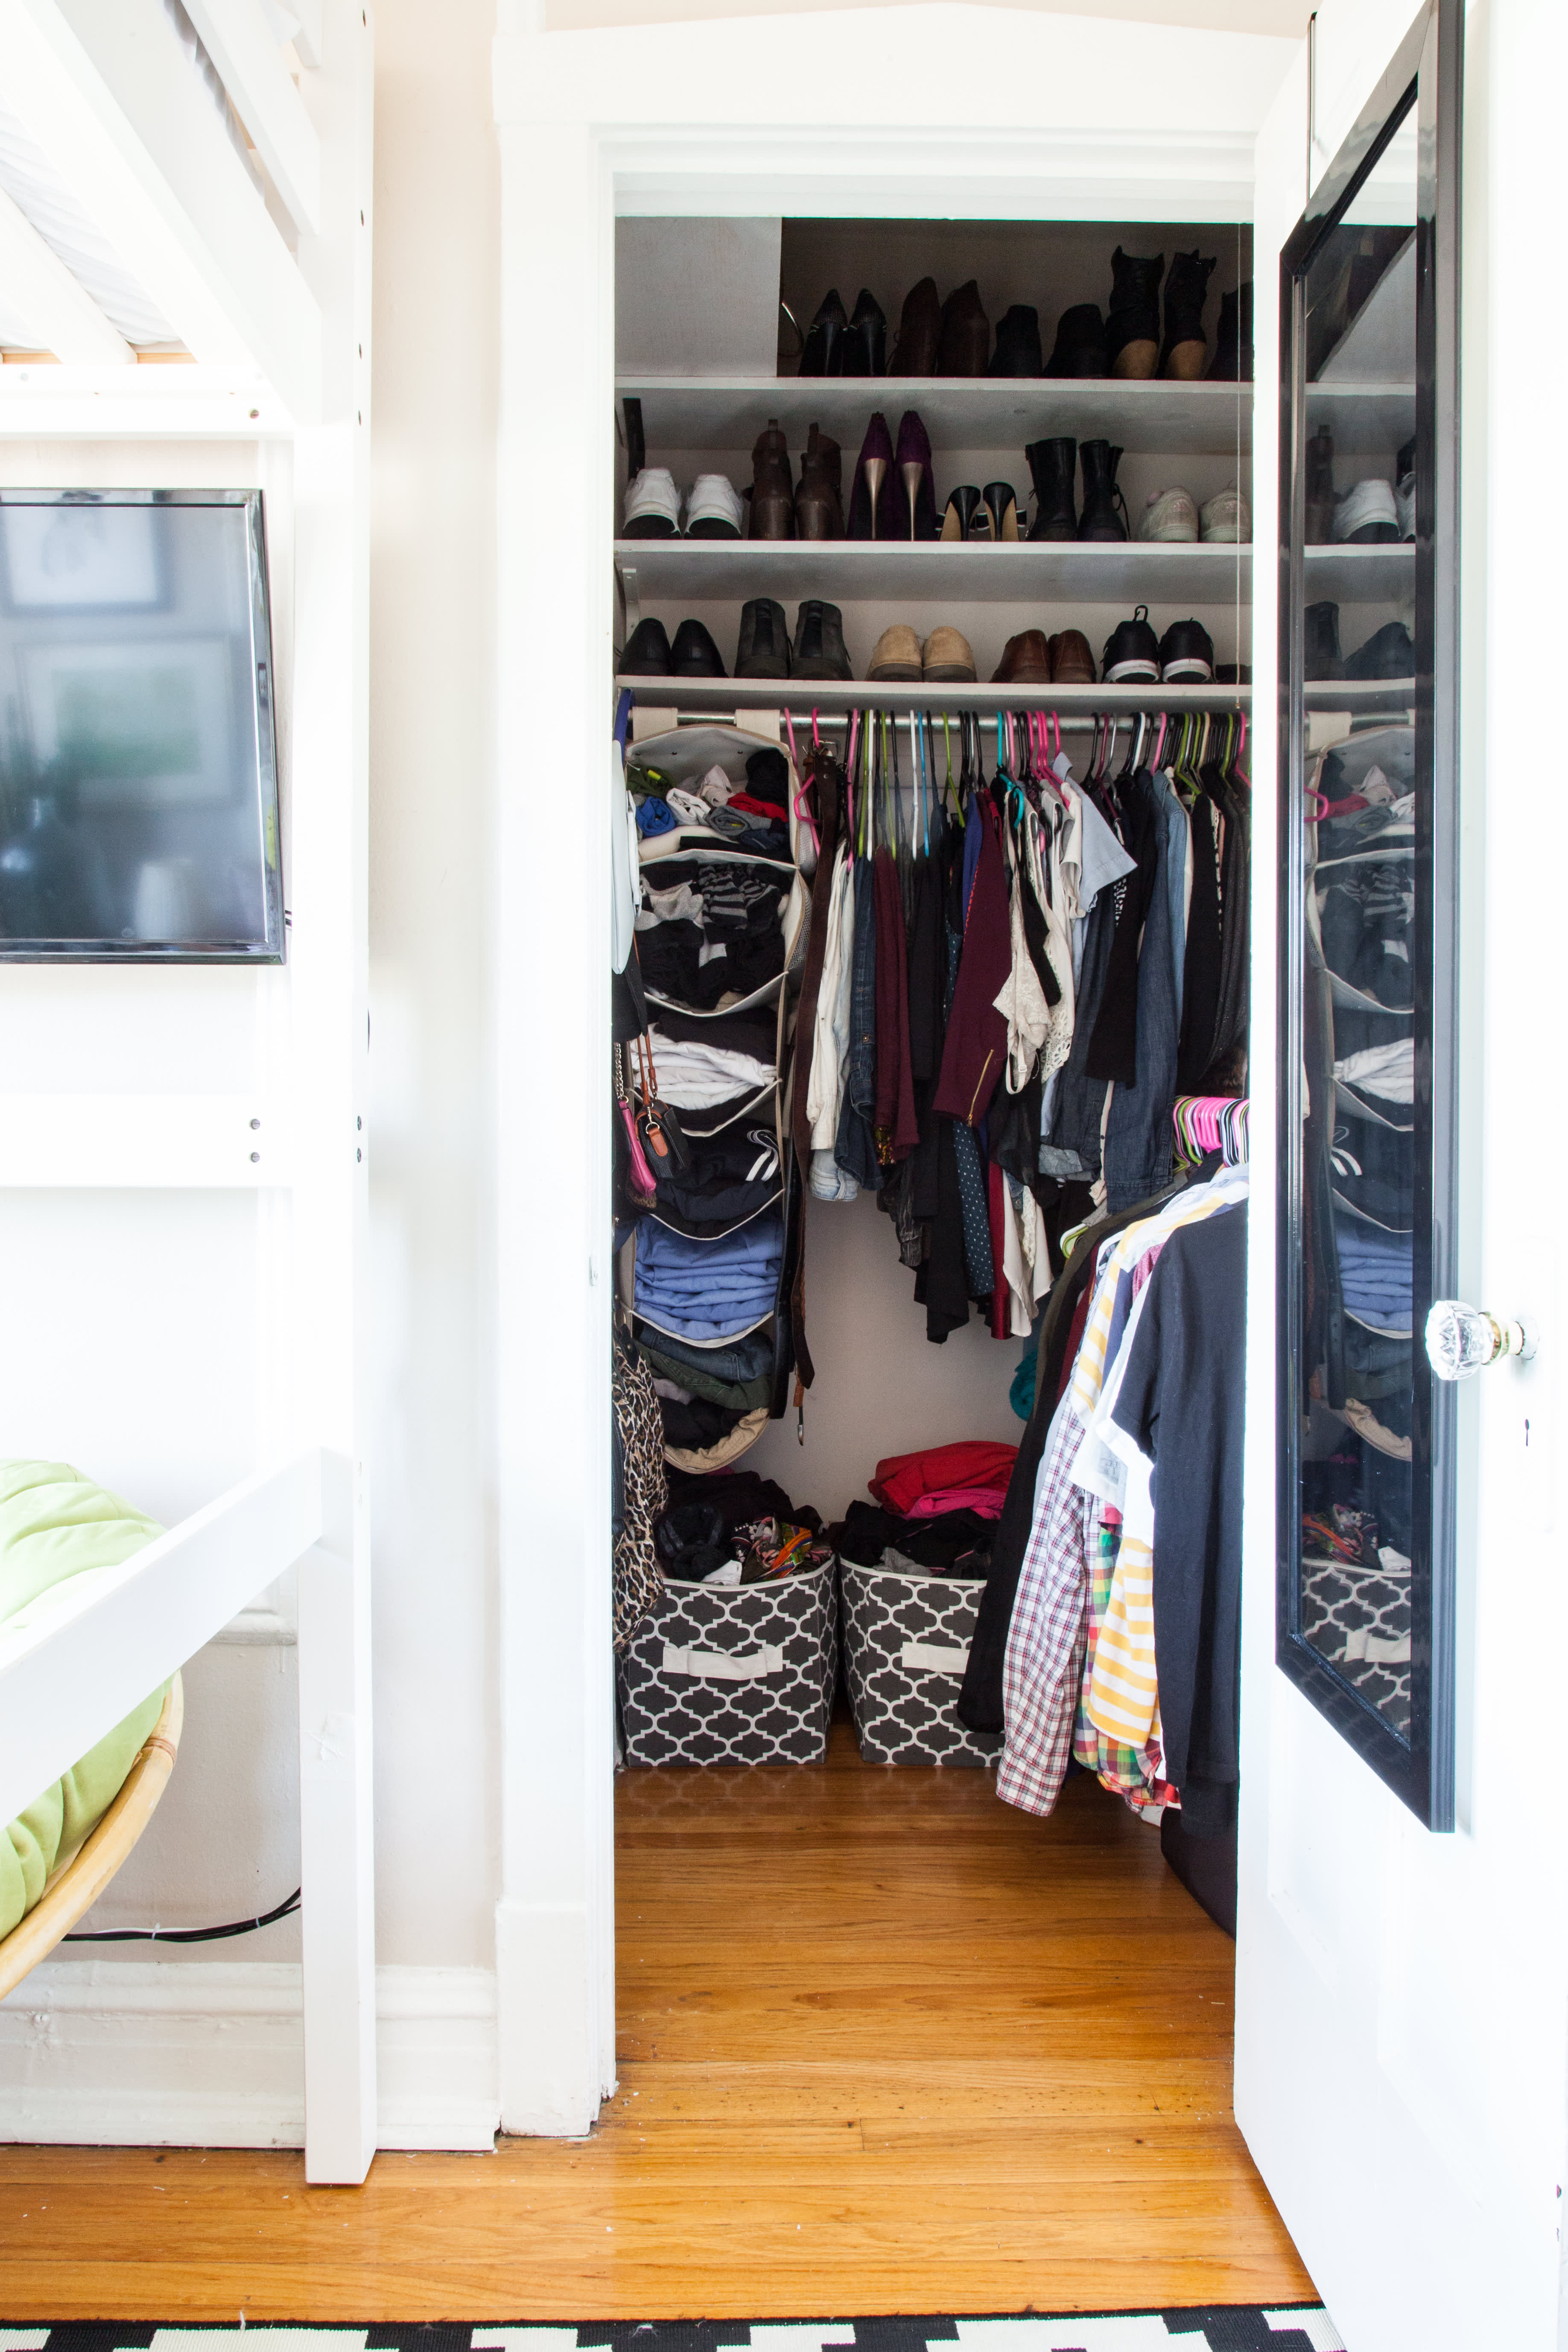 Closet Storage Ideas - Small Closet Organization | Apartment Therapy